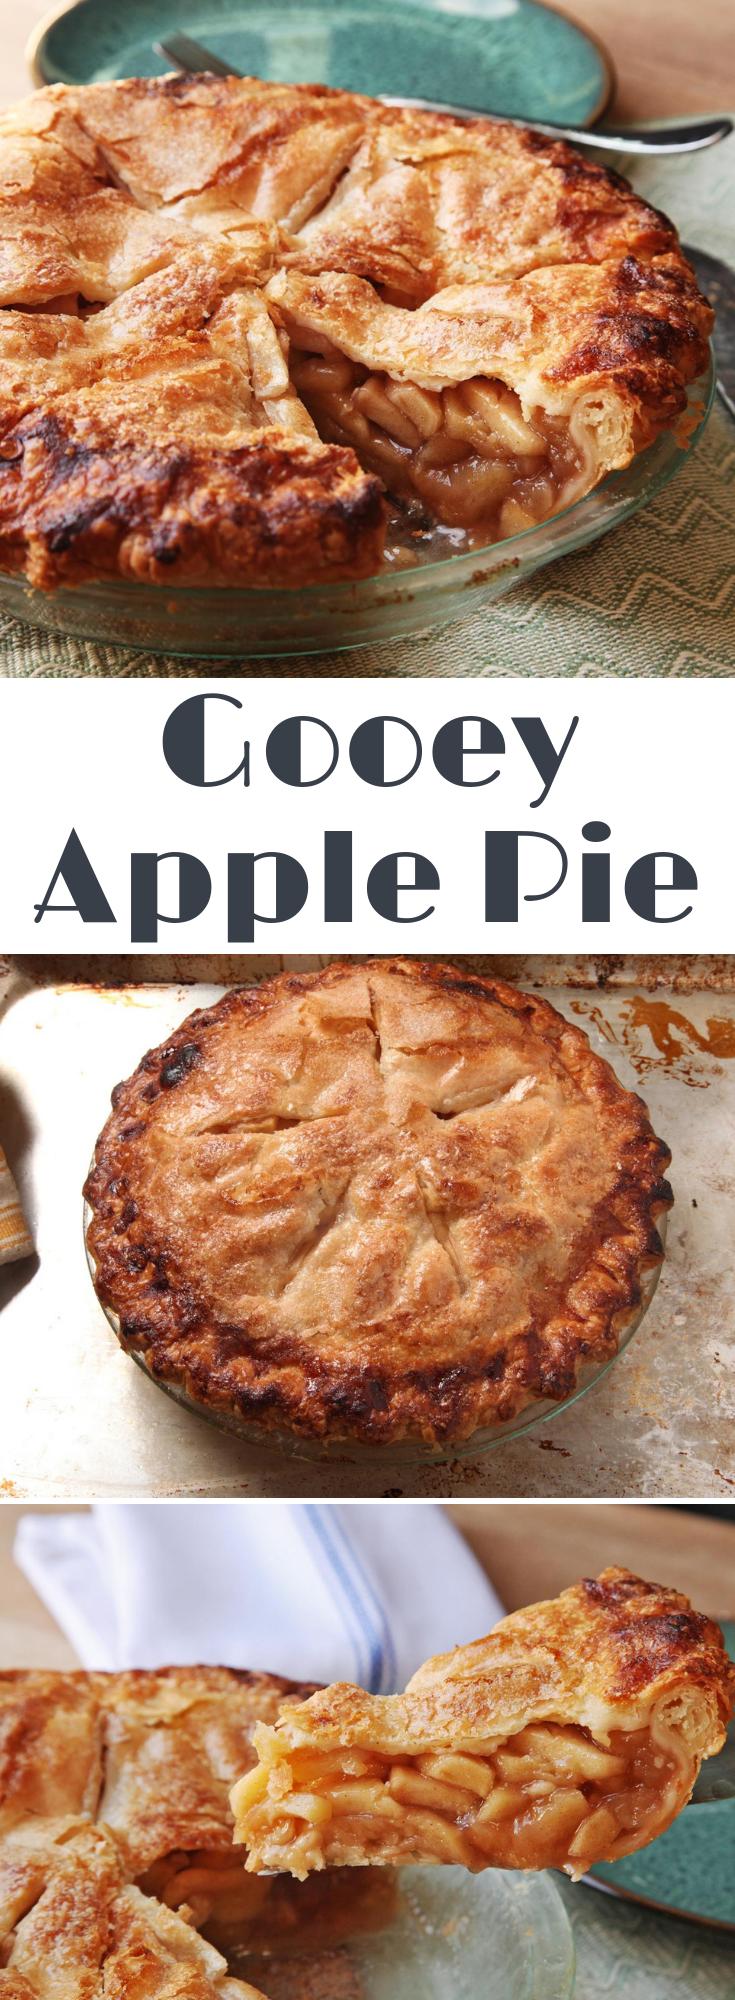 Gooey Apple Pie Recipe Recipe Apple Pie Recipes Deep Dish Apple Pie Apple Recipes